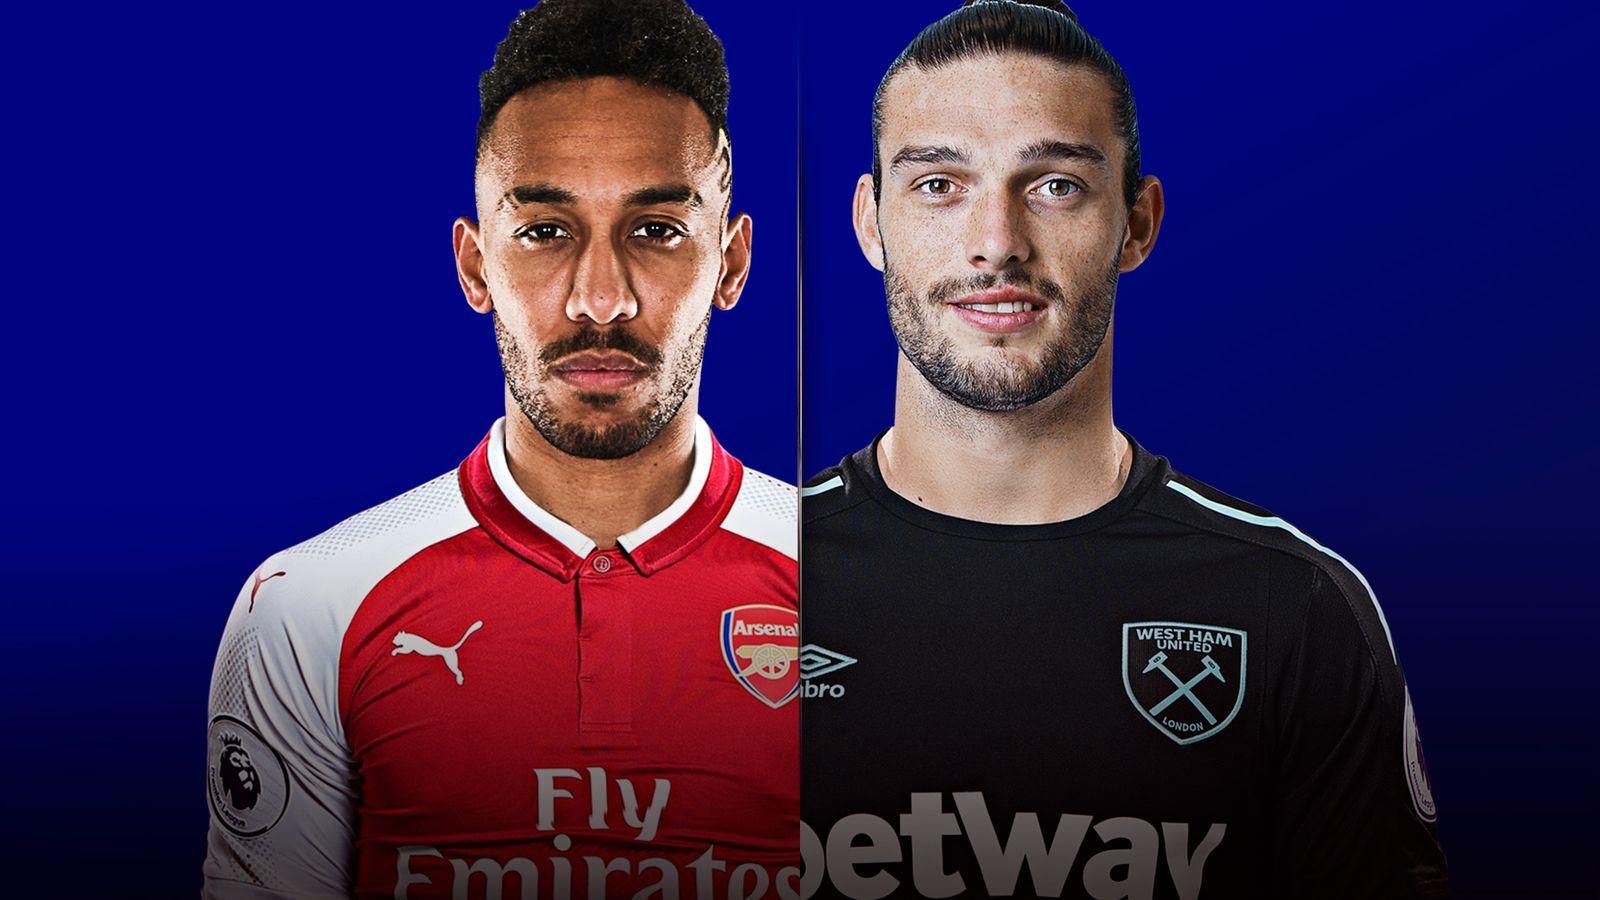 Match Preview - Arsenal vs West Ham | 22 Apr 2018